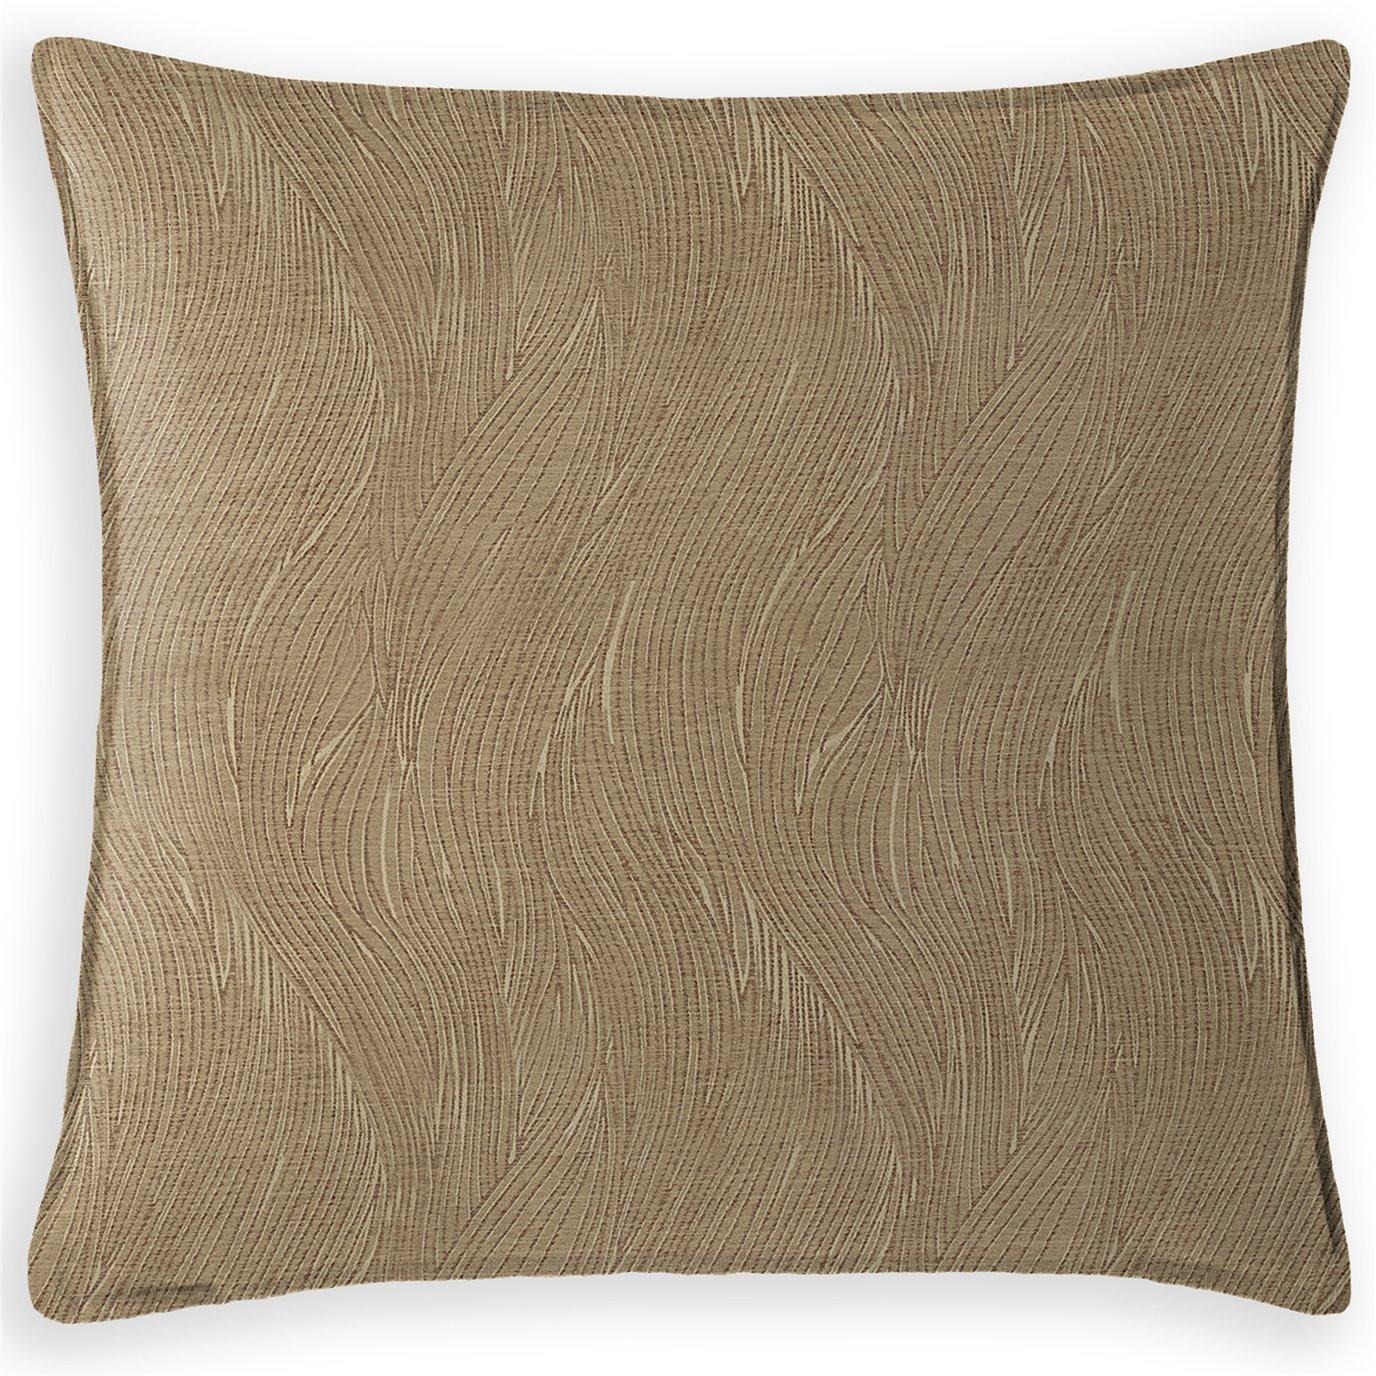 Elmwood Decorative Cushion - 24 Inch Square